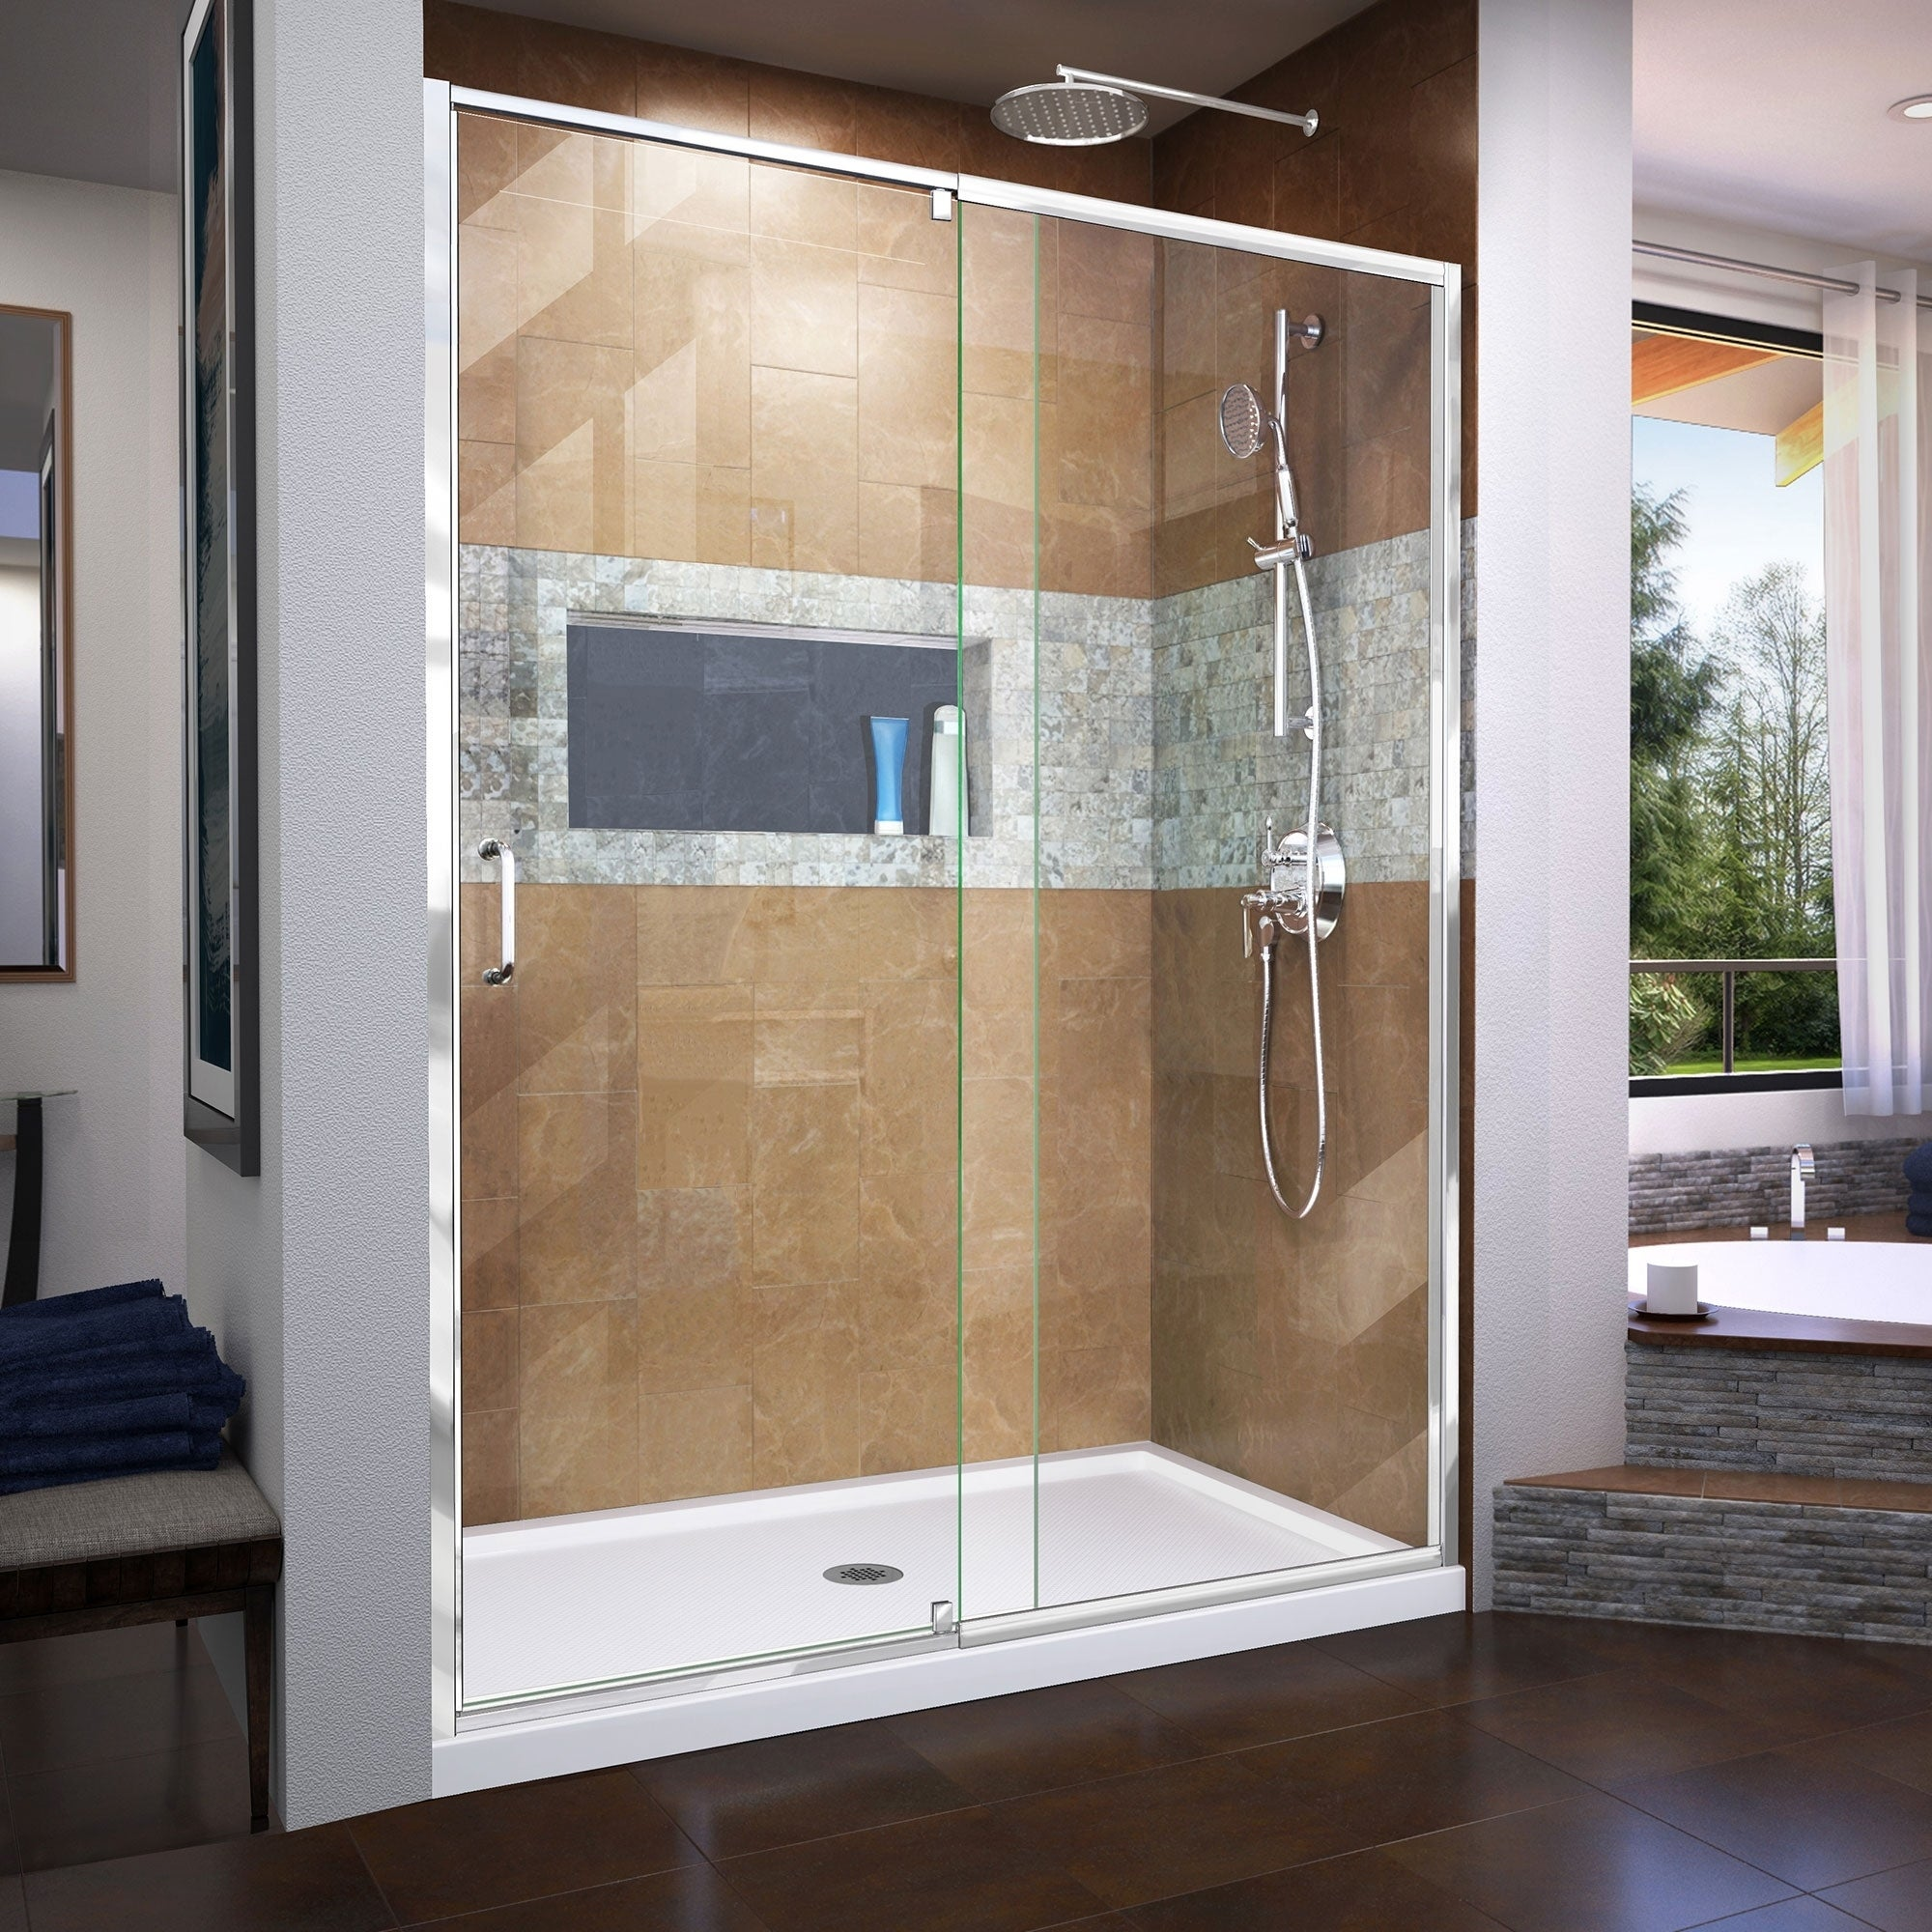 Dreamline Flex 56 - 60 in. W x 72 in. H Pivot Shower Door...